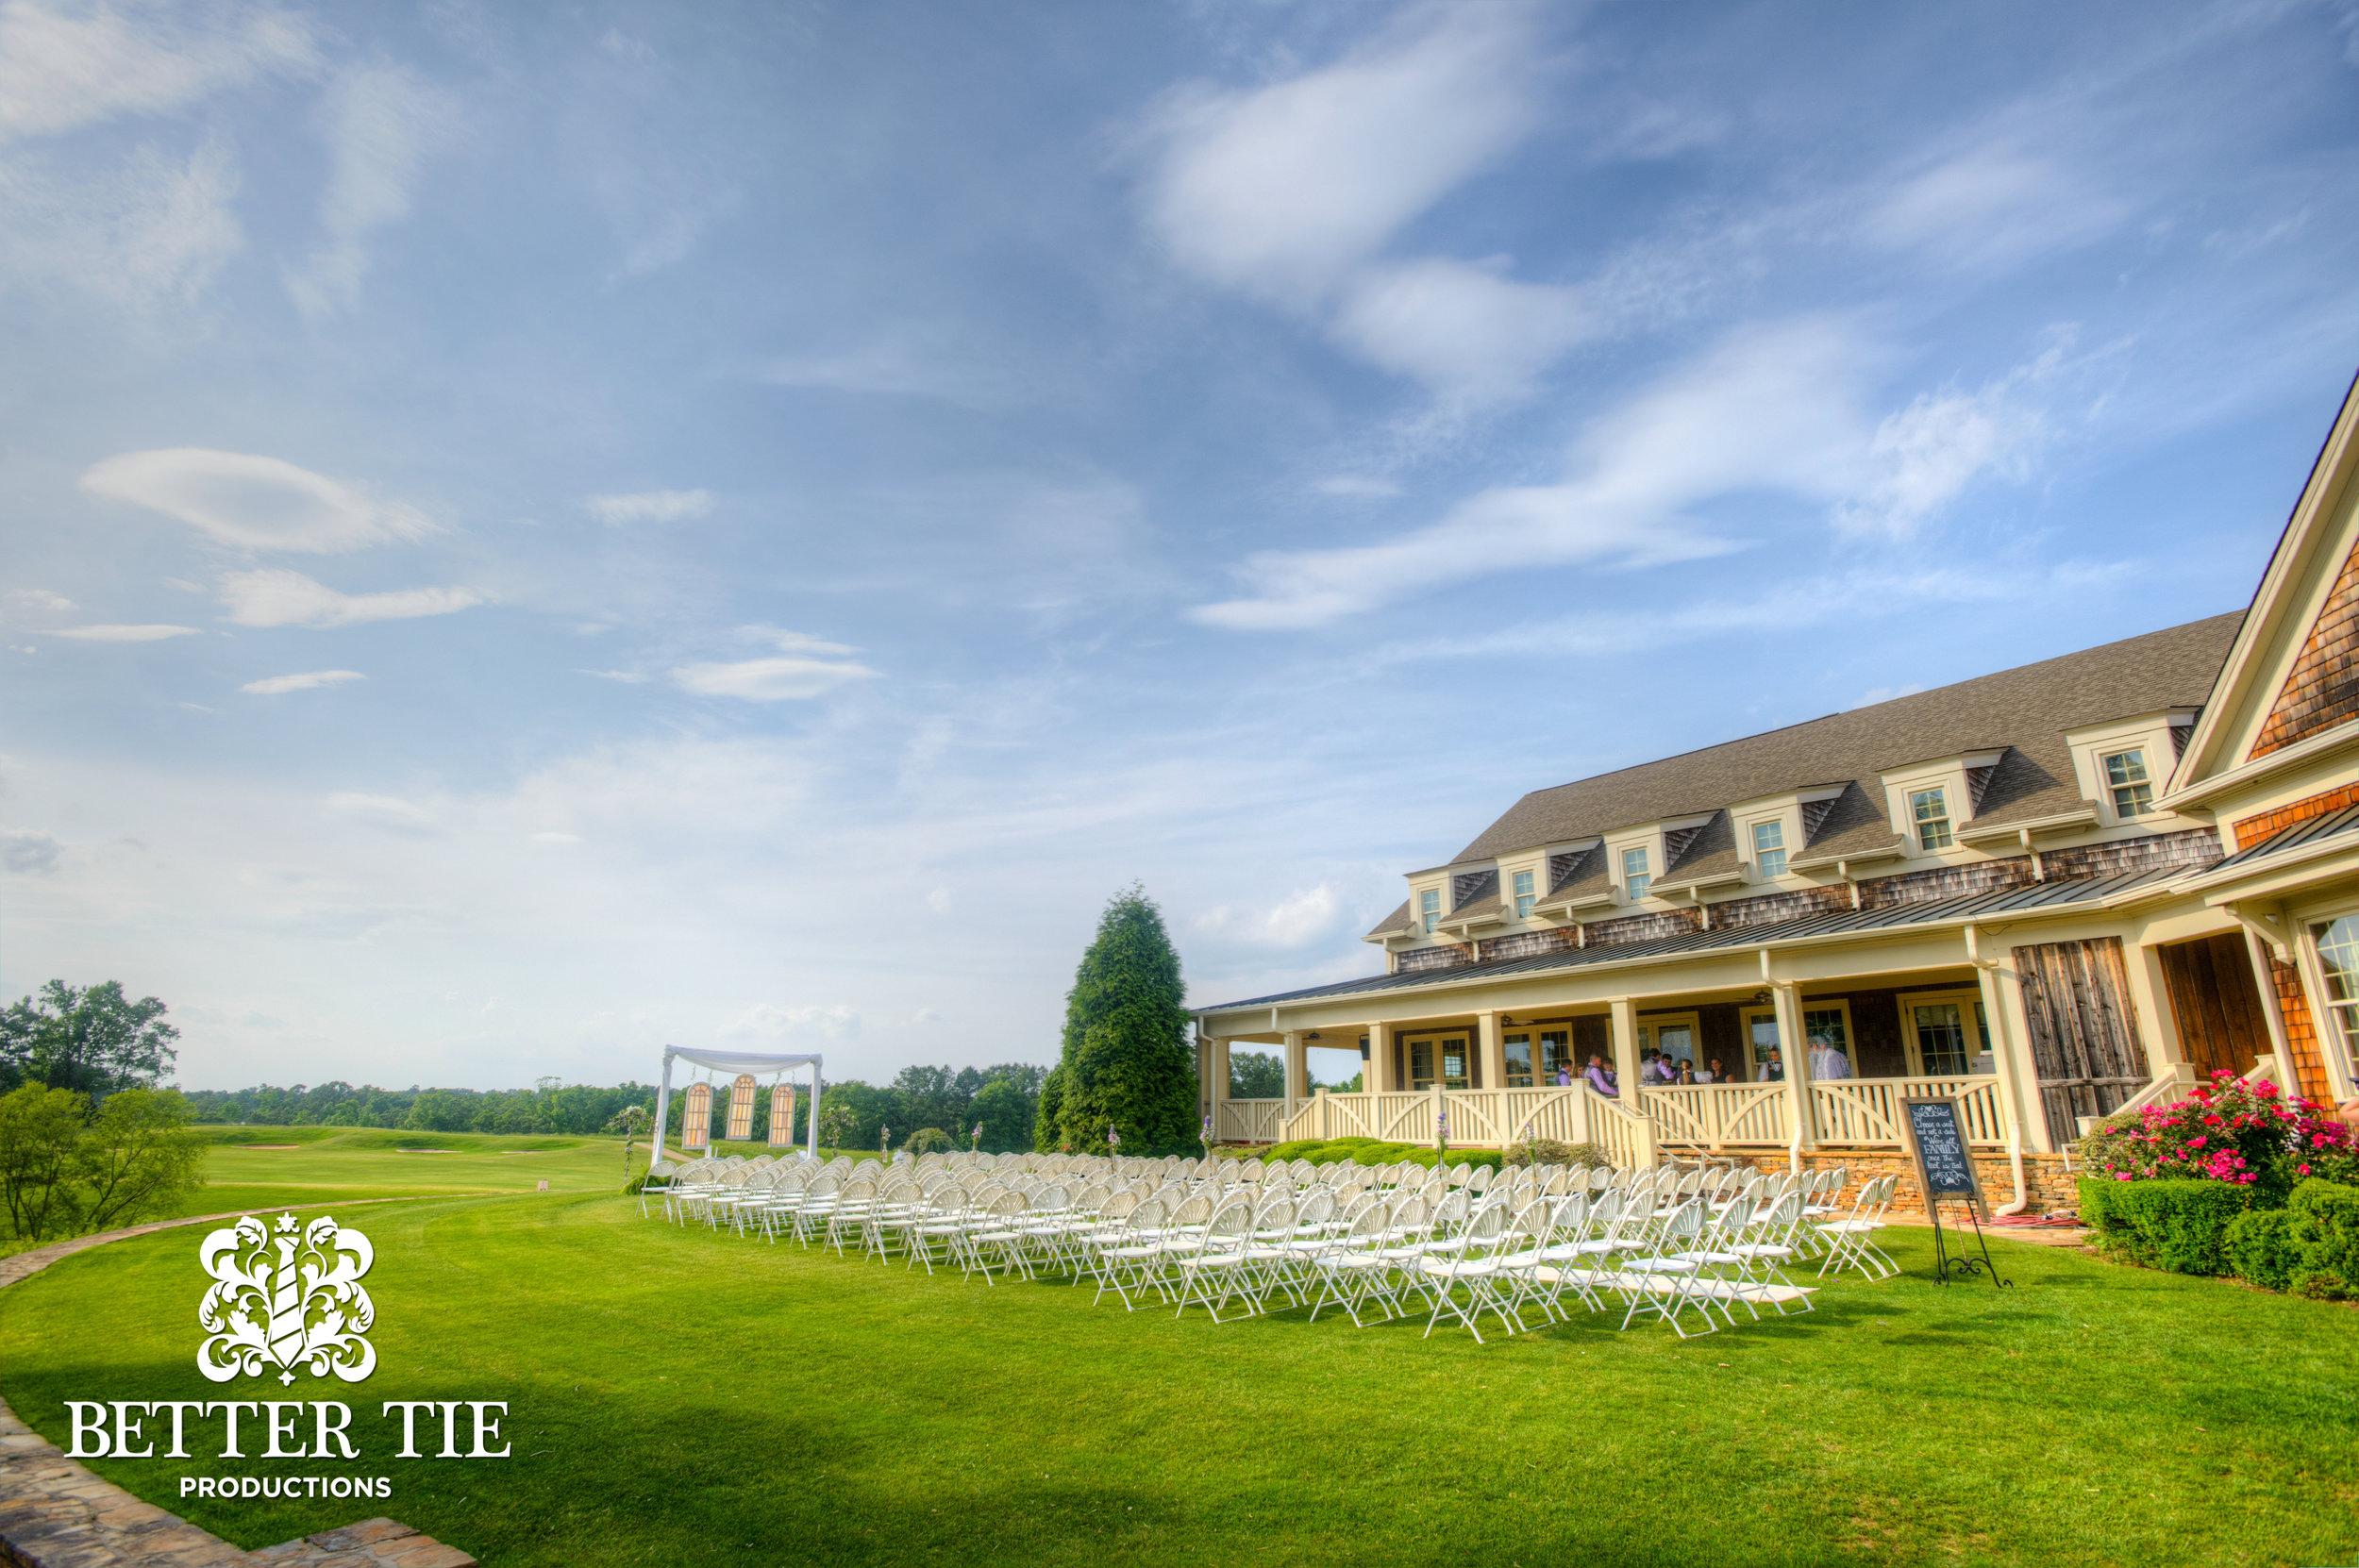 cateechee-golf-club-wedding-13.jpg